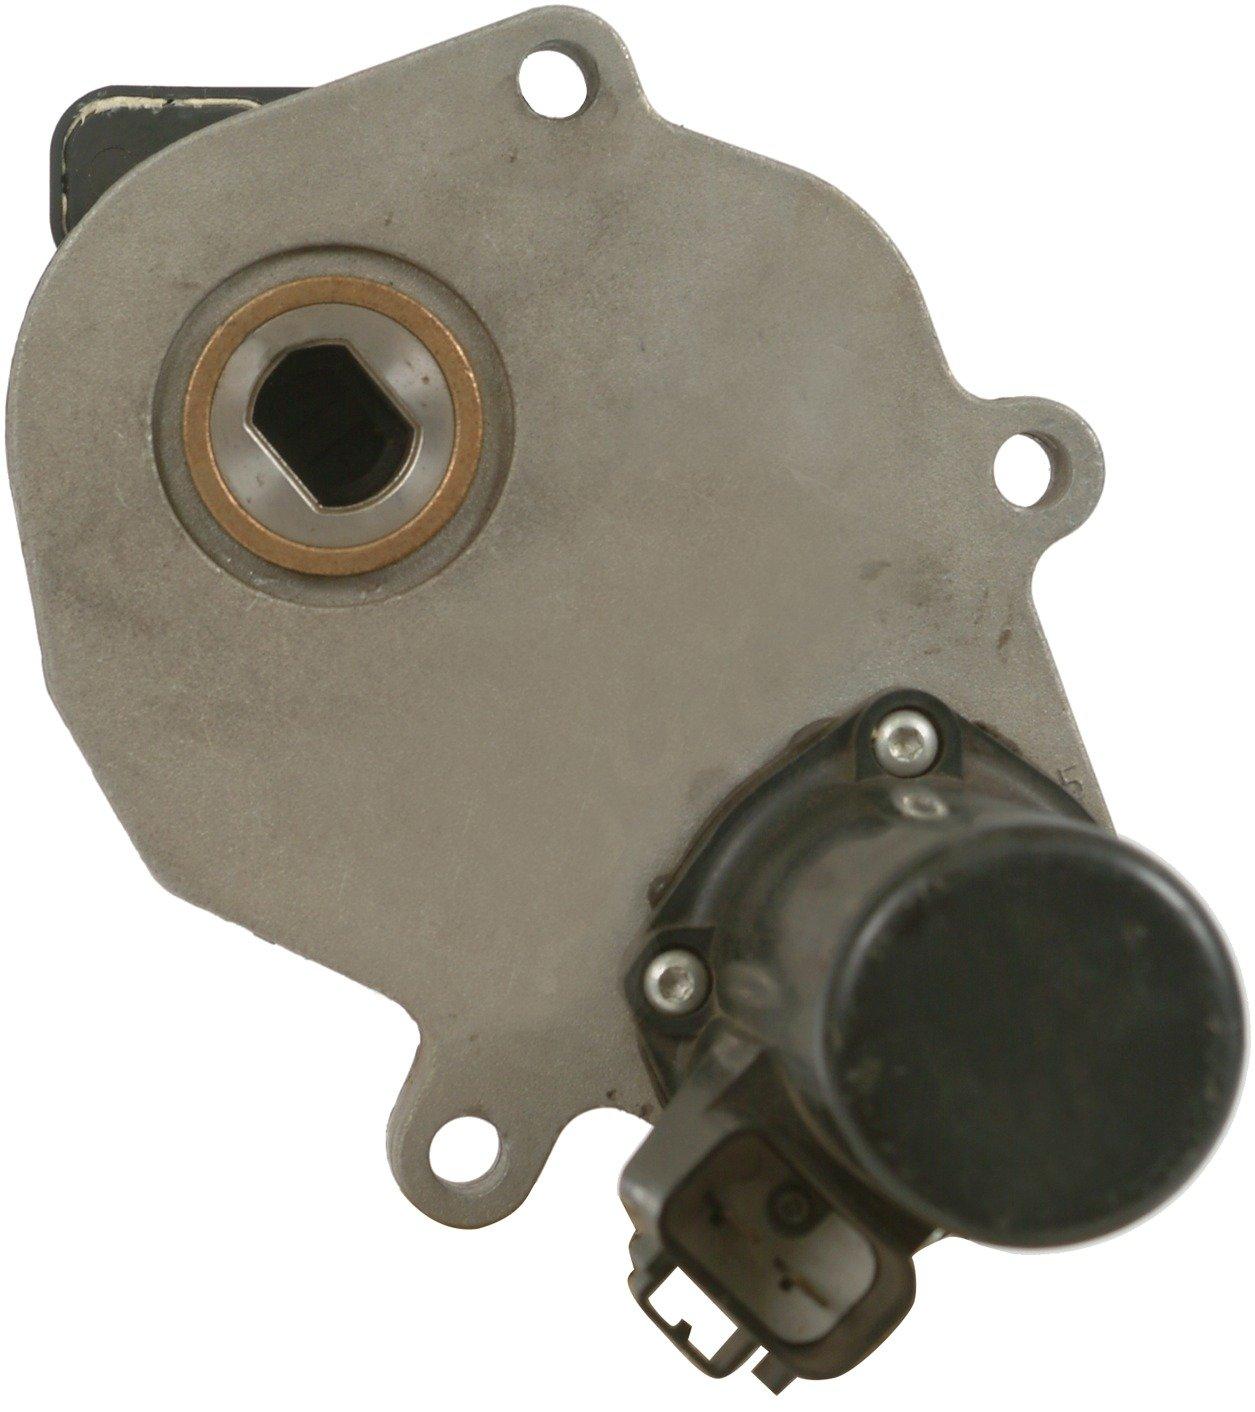 Cardone 48-205 Remanufactured Transfer Case Motor A-1 Cardone